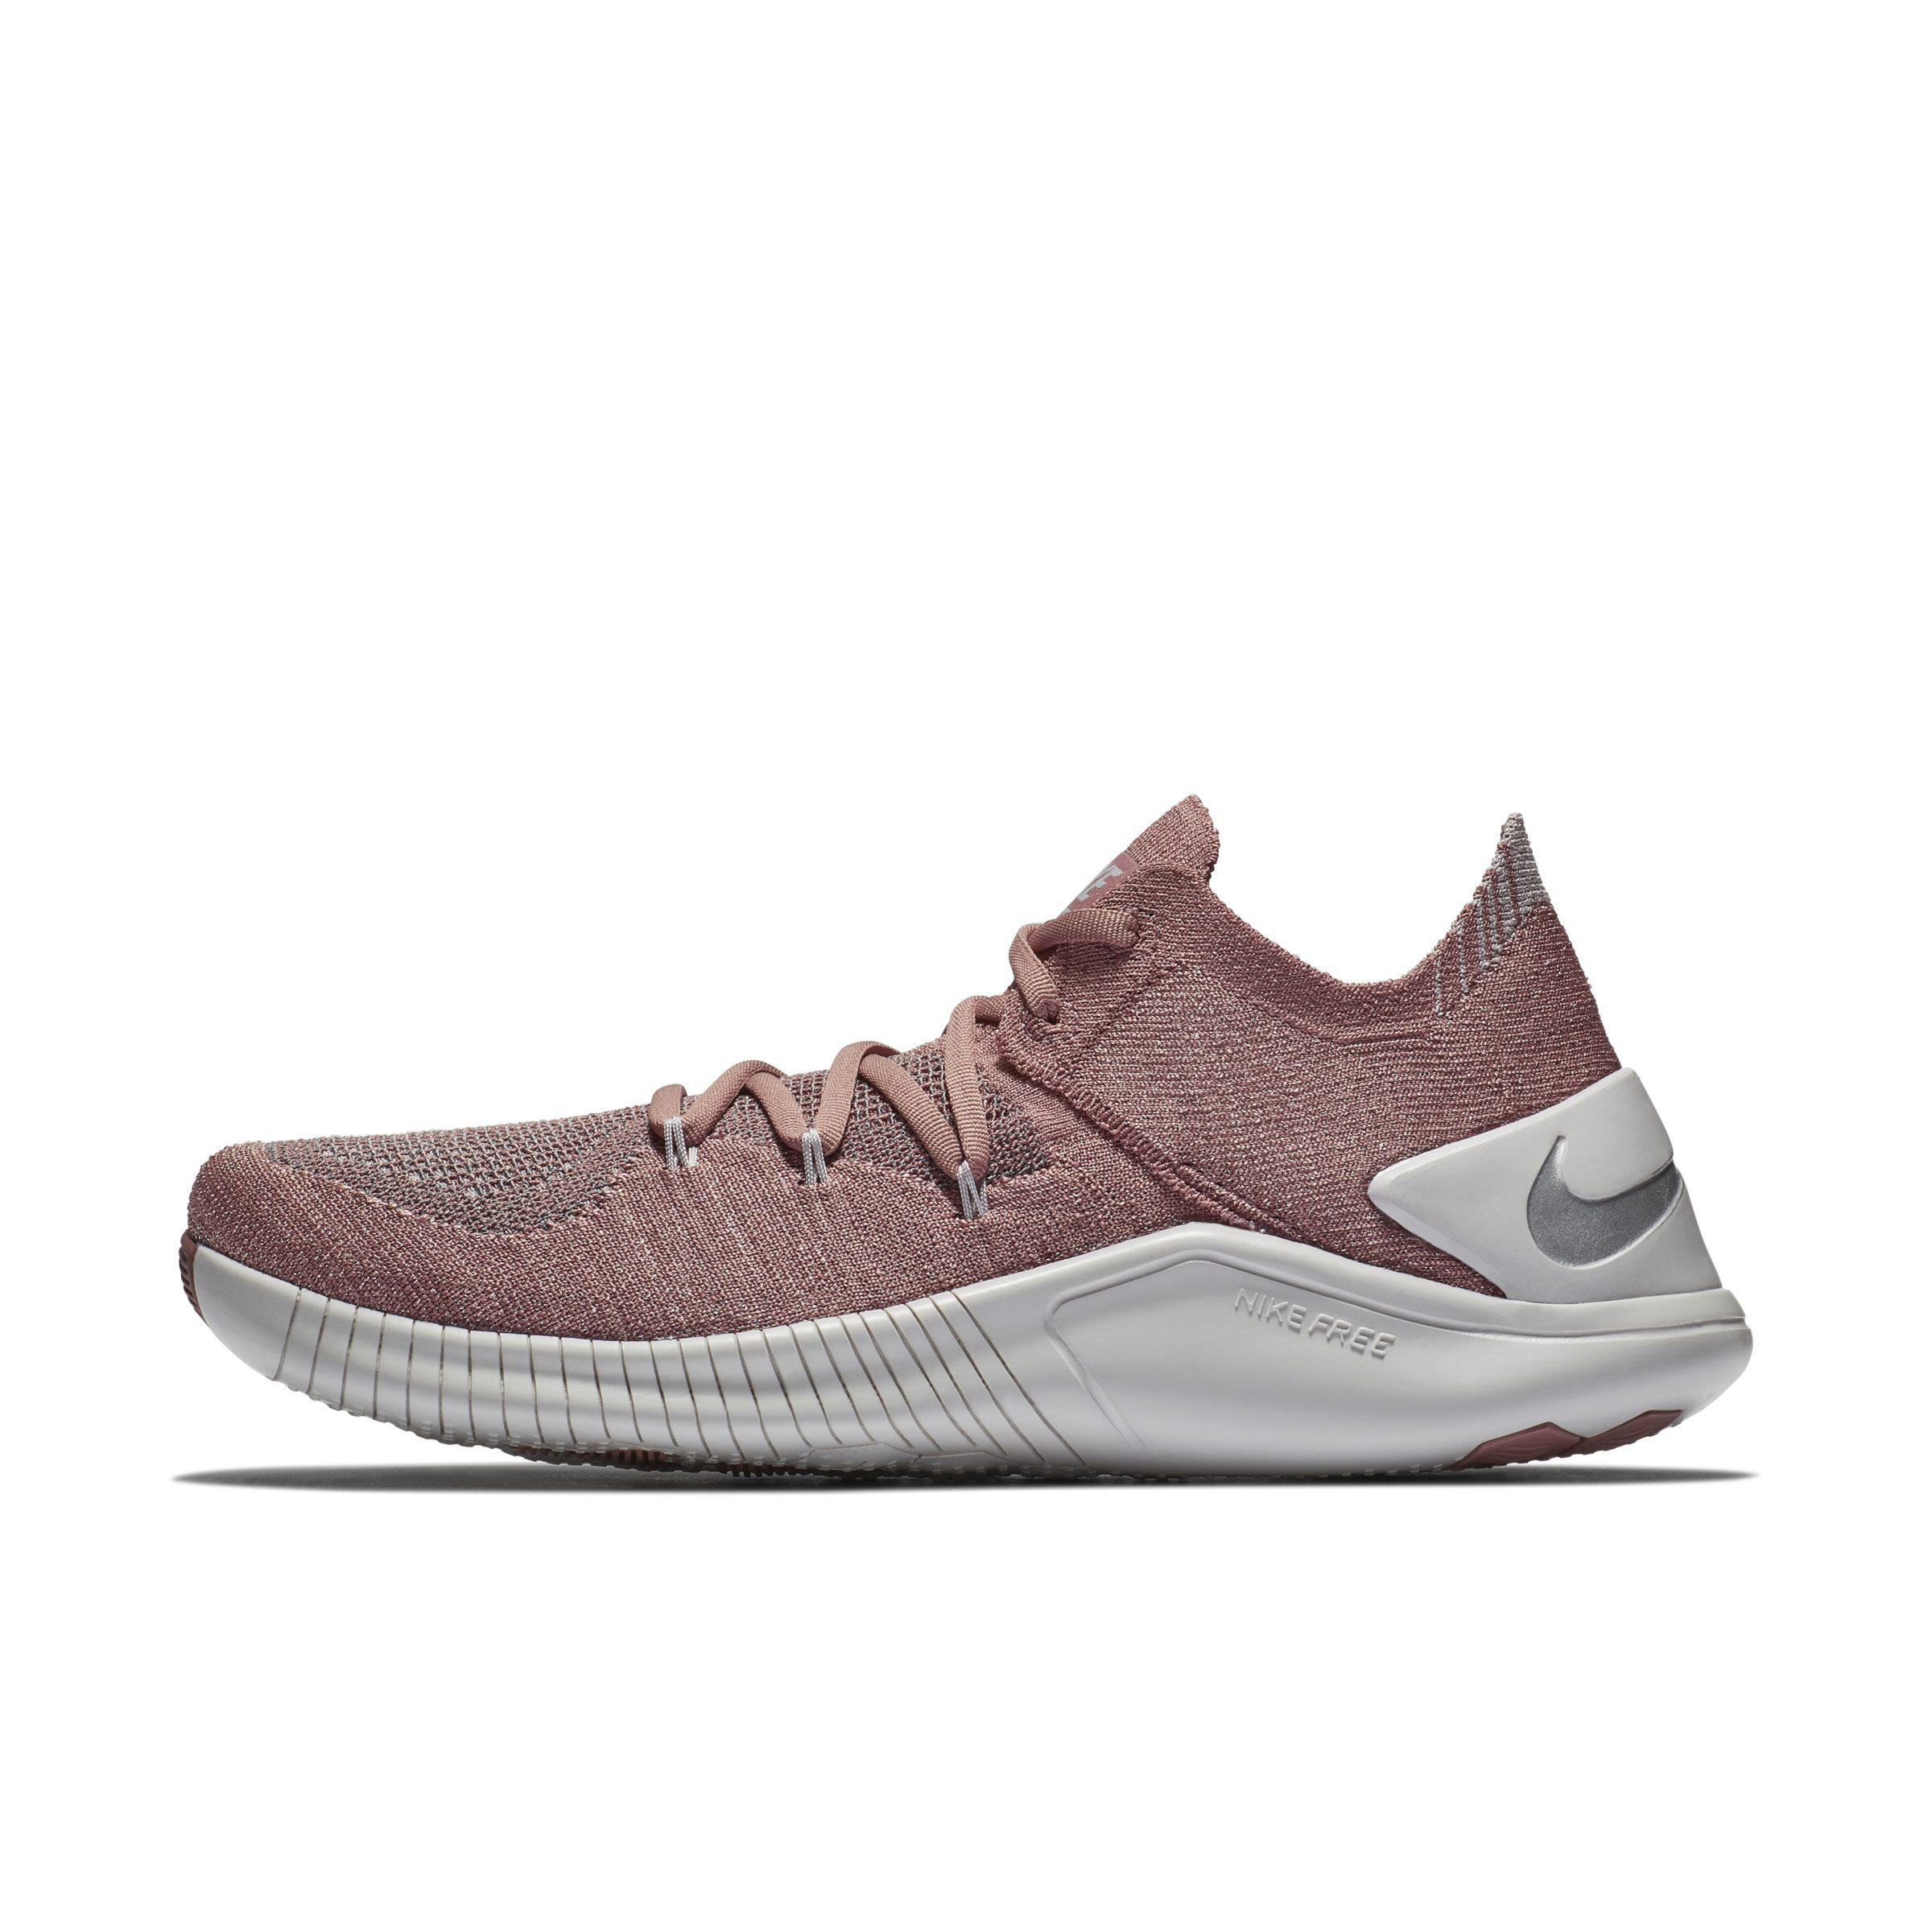 15ad3d5aa402c Nike. Women s Purple Free Tr Flyknit 3 Lm Gym hiit cross Training Shoe